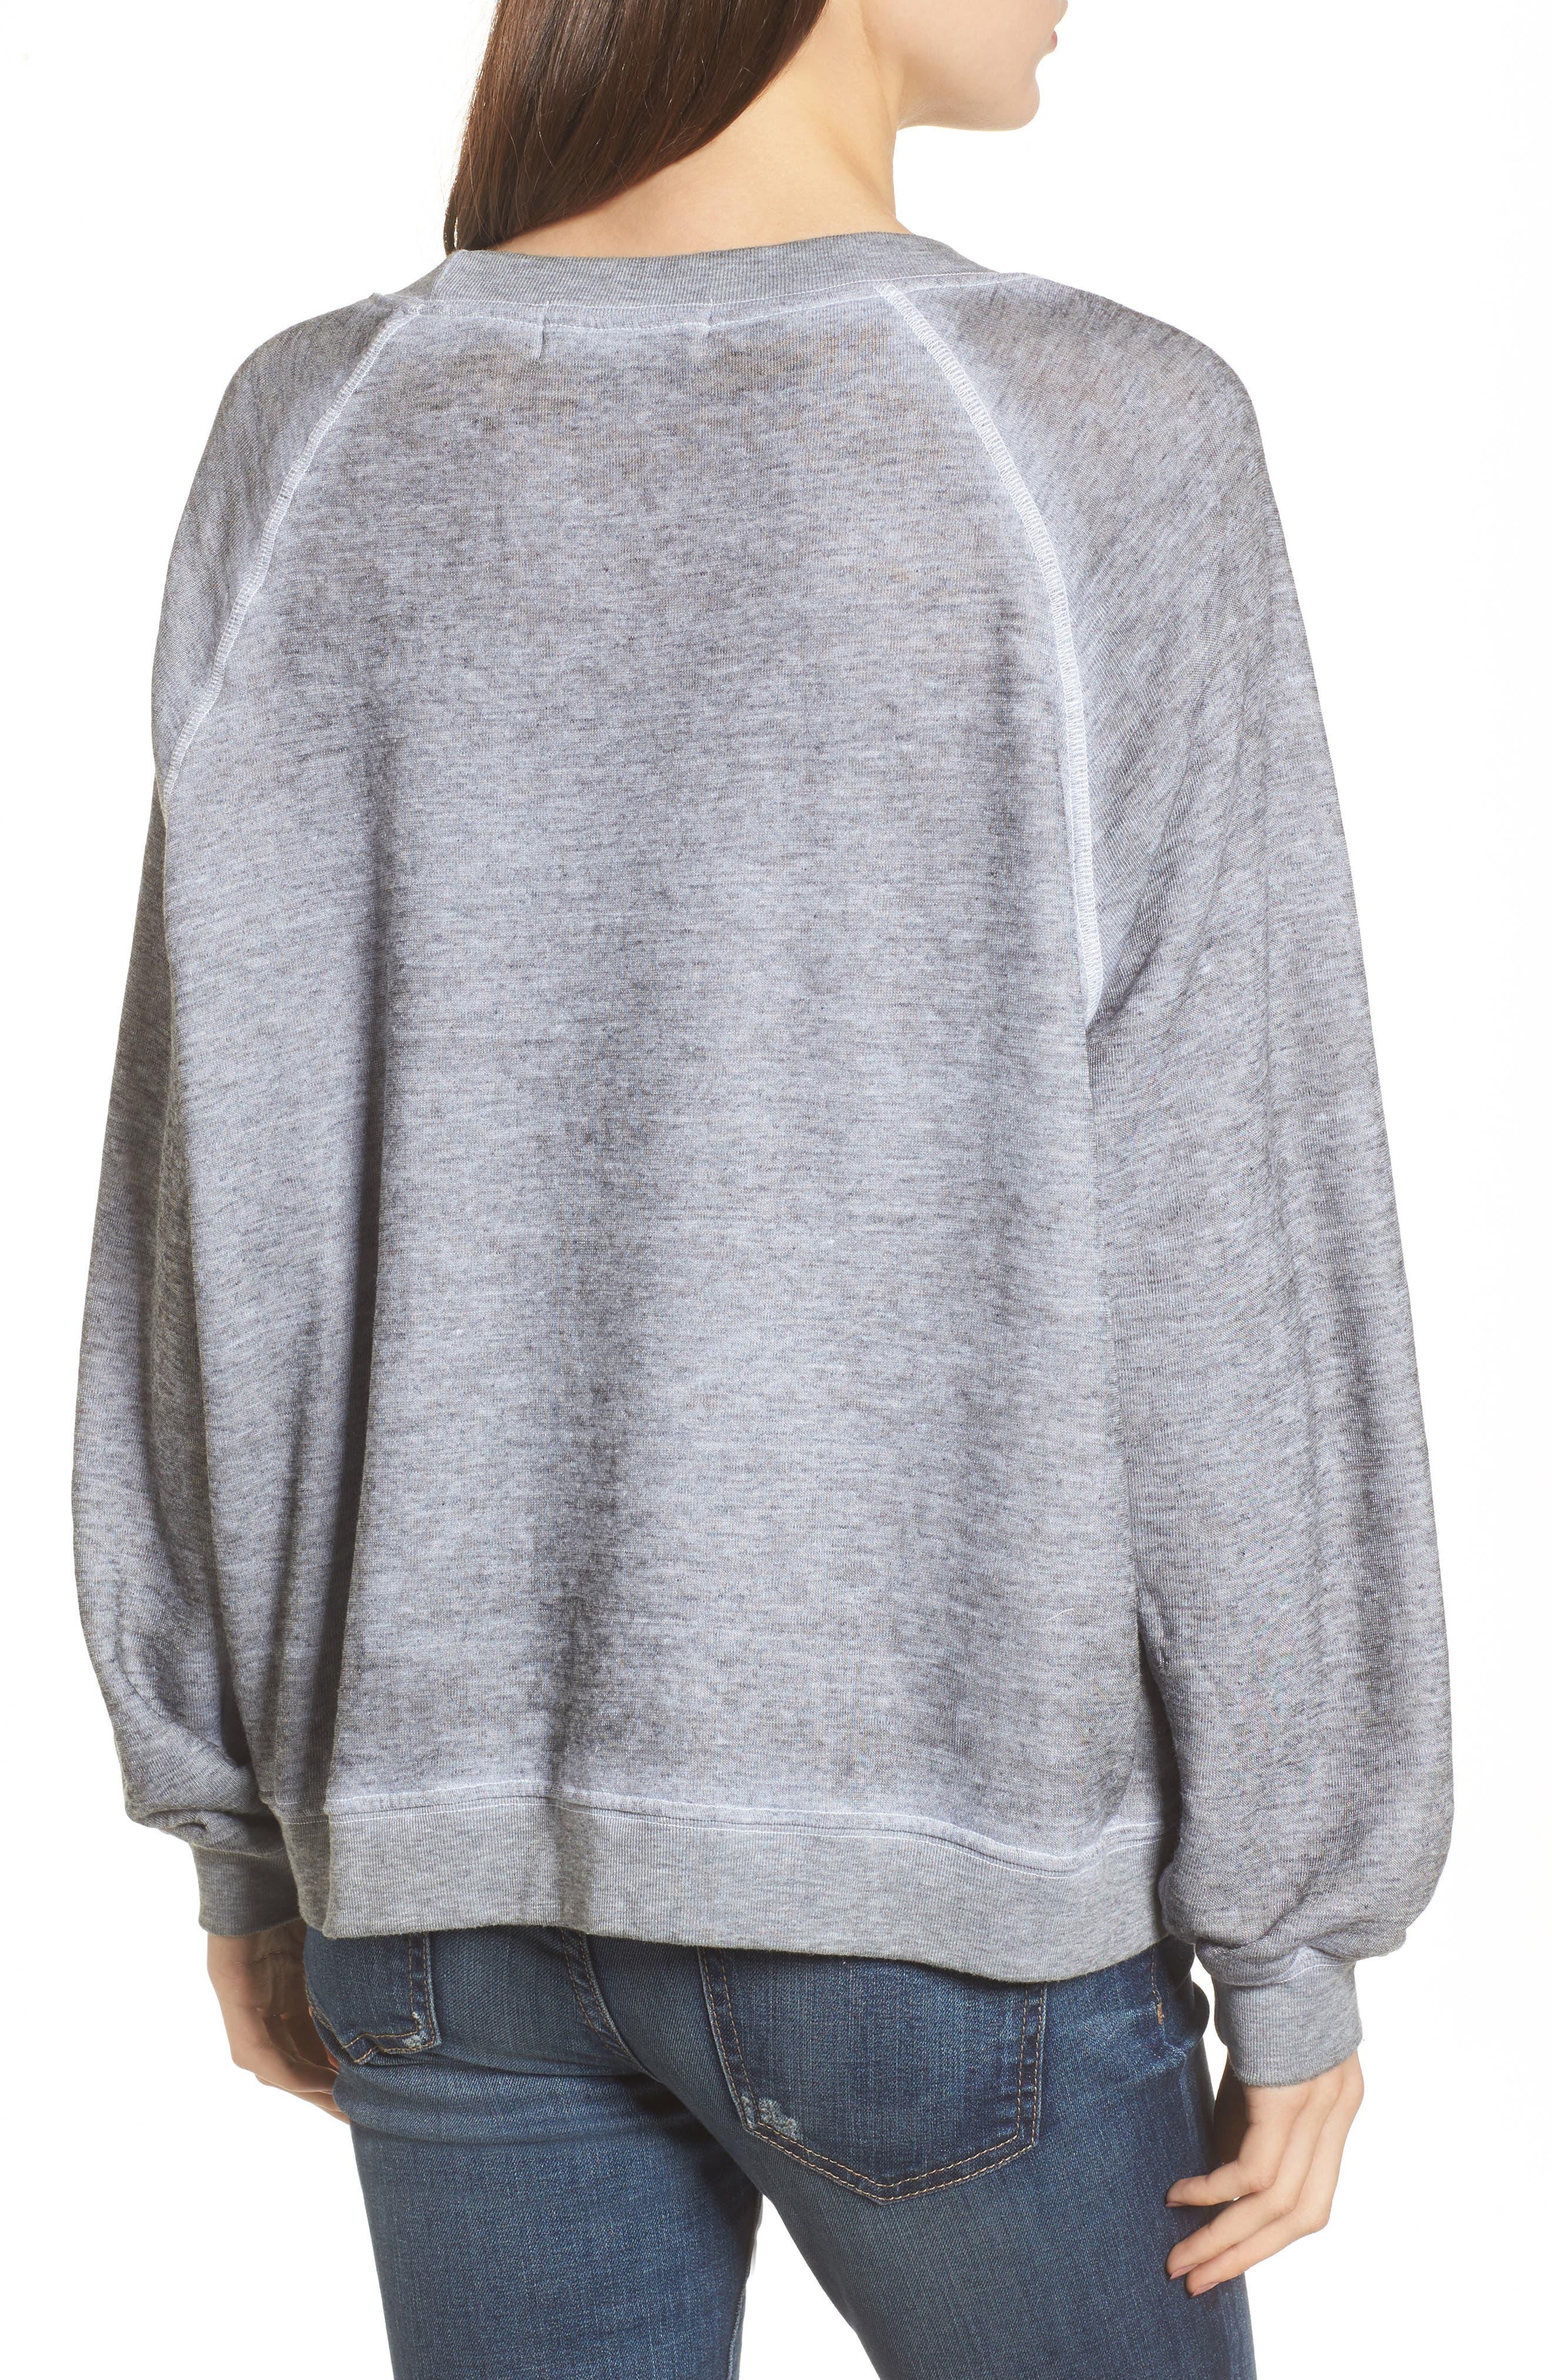 I Love My Dog - Sommers Sweatshirt,                             Alternate thumbnail 2, color,                             020